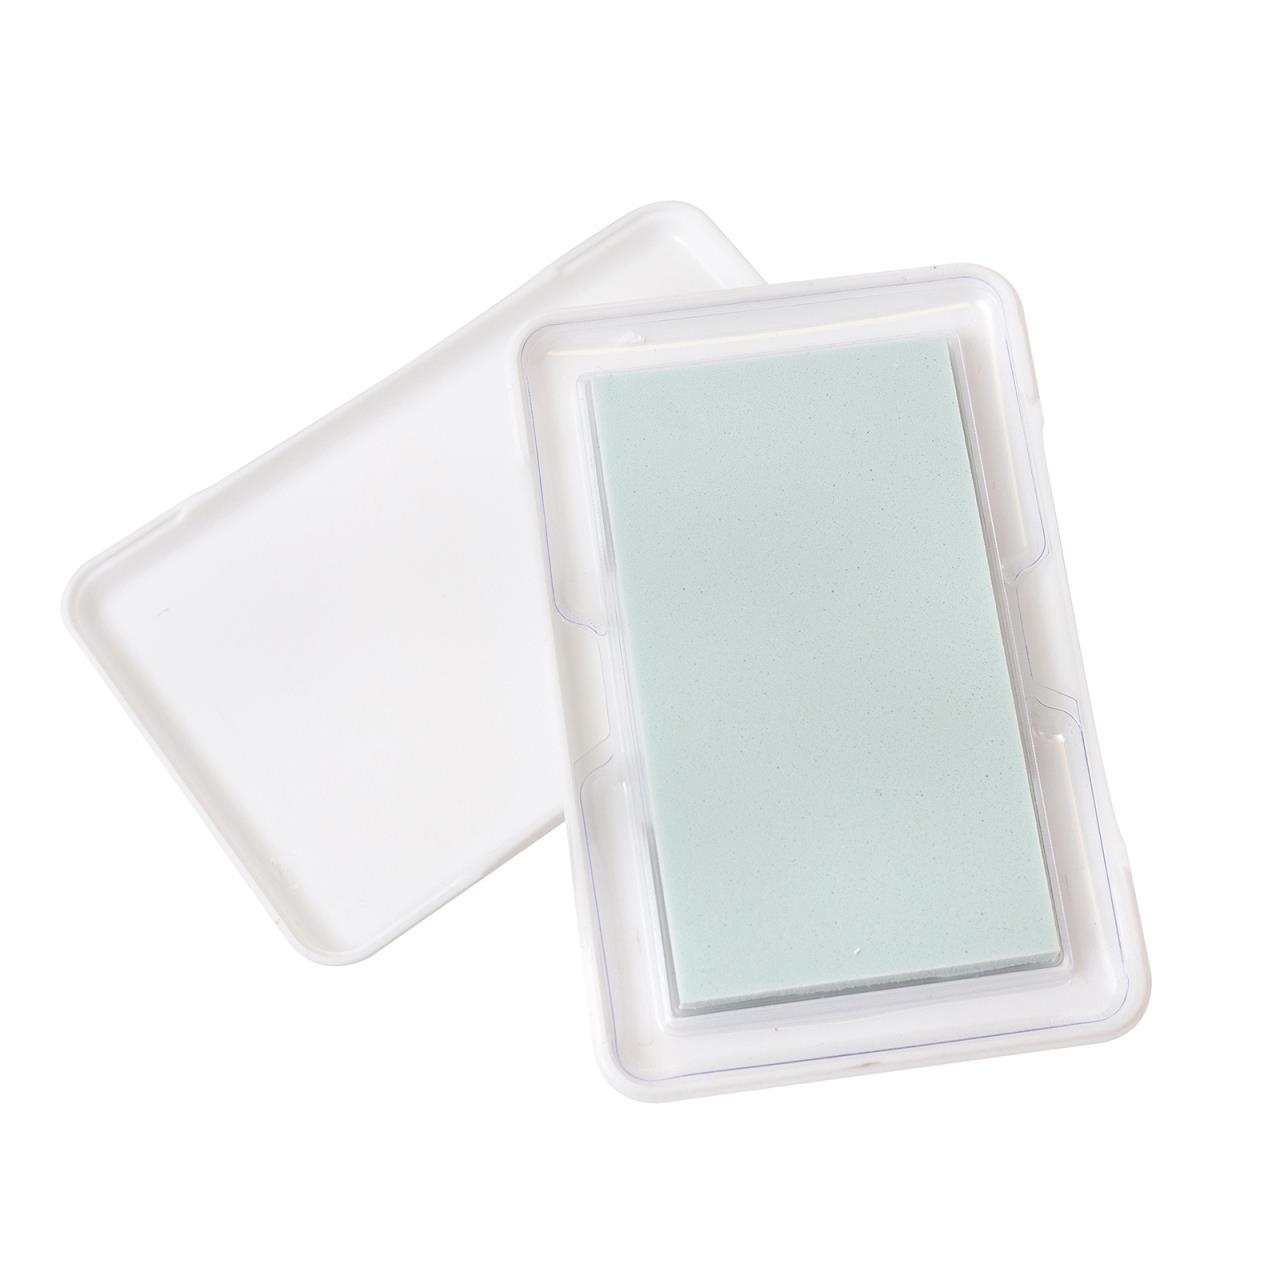 Minc Toner Stamping Stamp Pad, Heidi Swapp - 718813152839